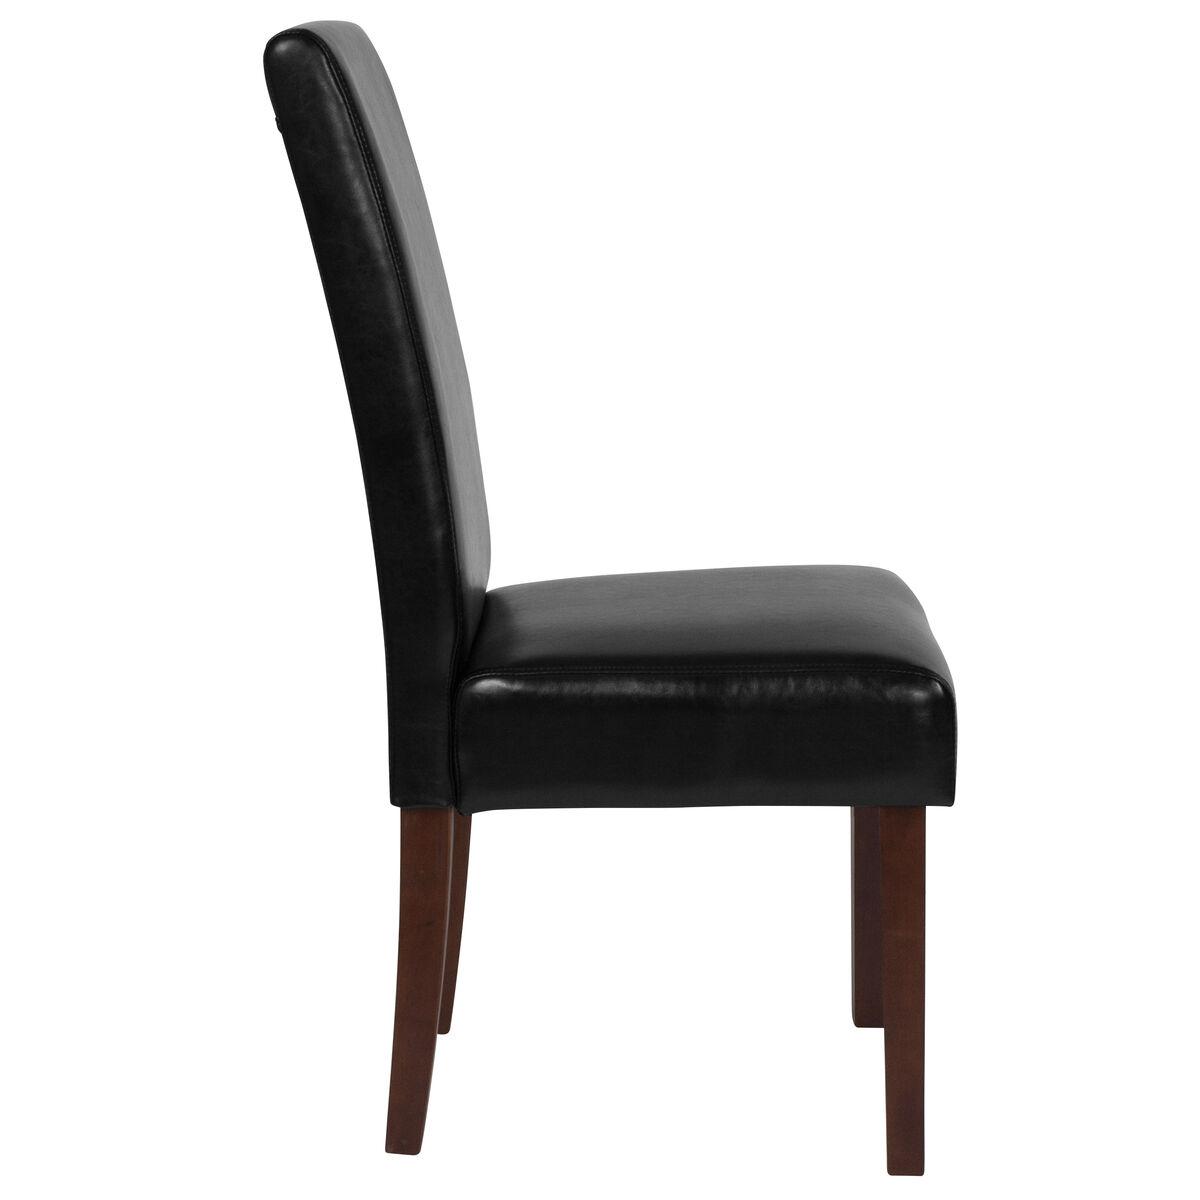 black leather parsons chair qy a37 9061 bkl gg churchchairs4less com